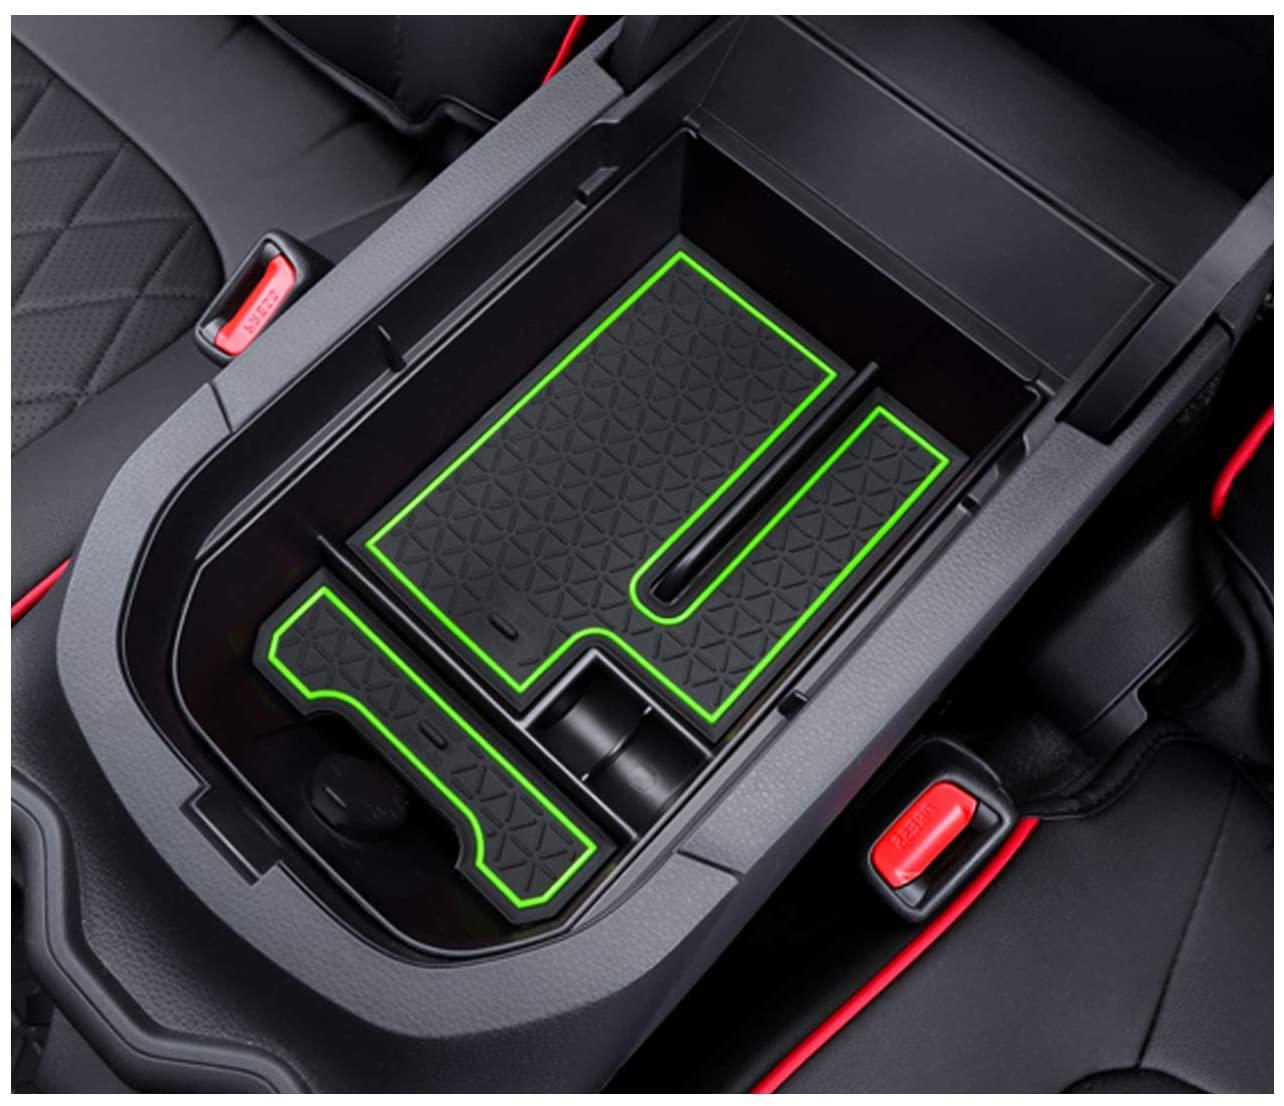 YEE PIN 2019 RAV 4 Center Console Tray Organizer Car Glove Box Storage Box Armrest Box Accessories for 2019 2020 RAV 4 XA50 Console Organizer (green)